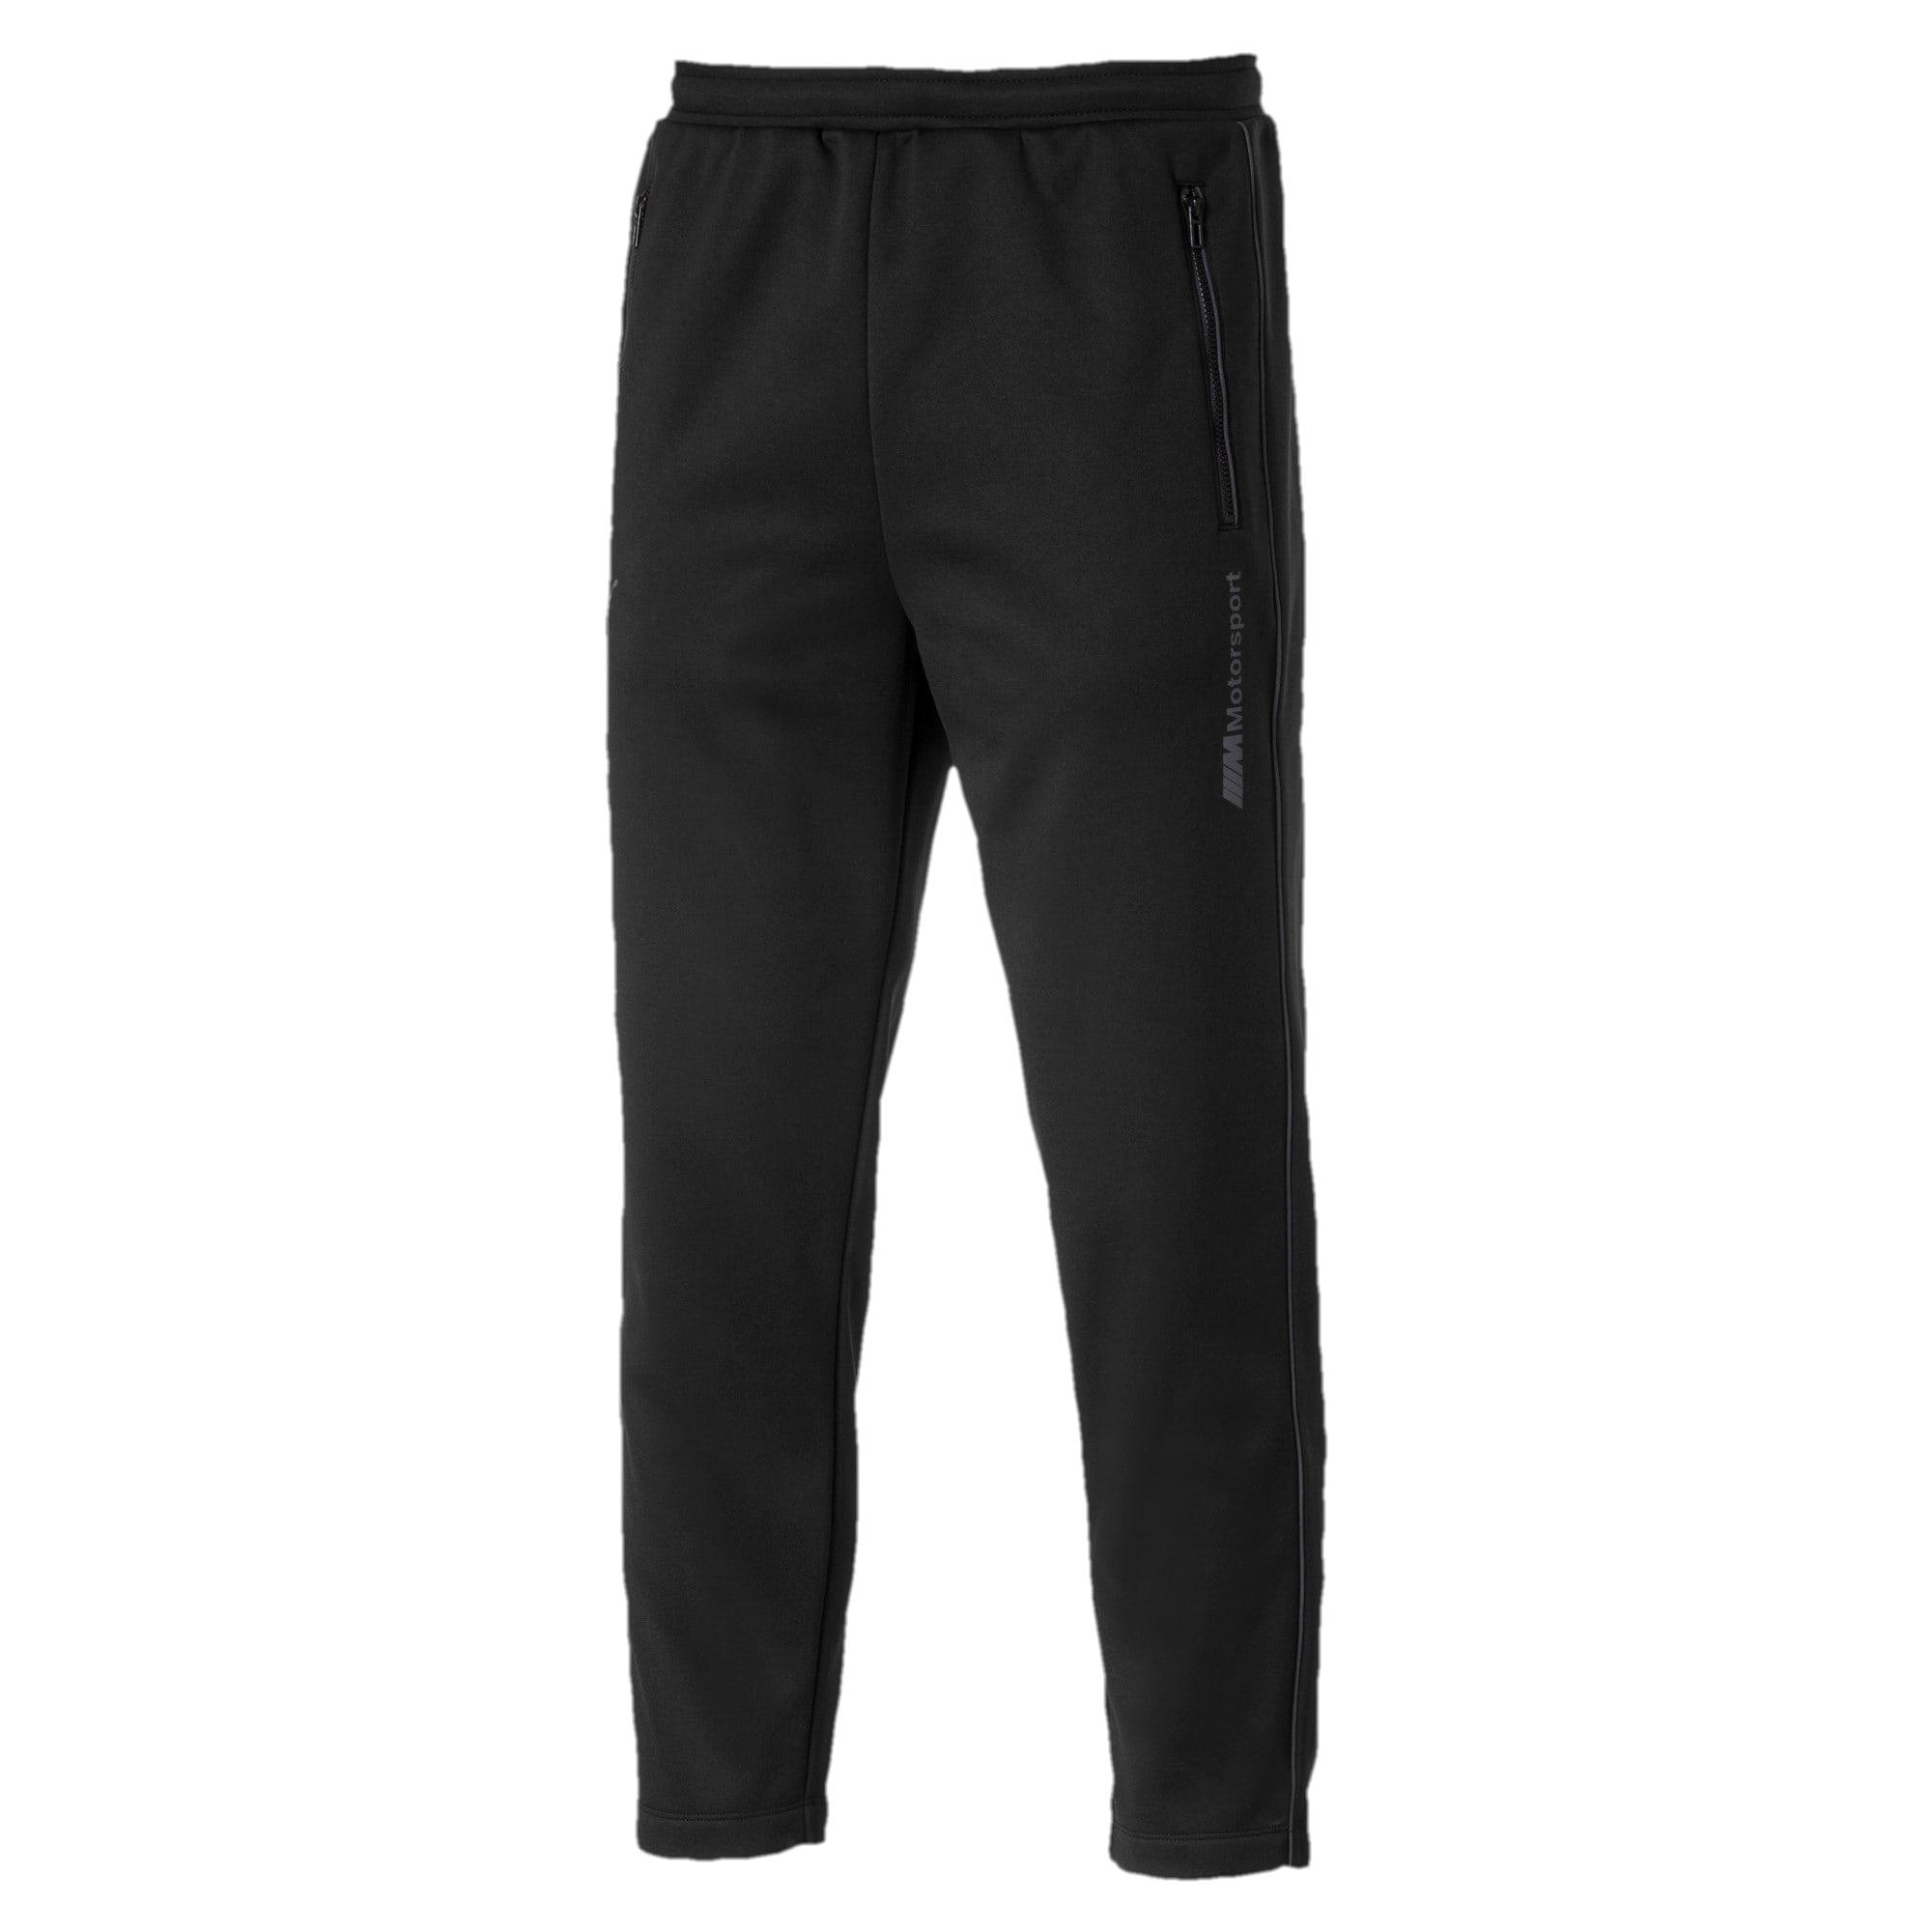 Miniatura 1 de Pantalones deportivos BMW M  Motorsport Life para hombre, Puma Black, mediano